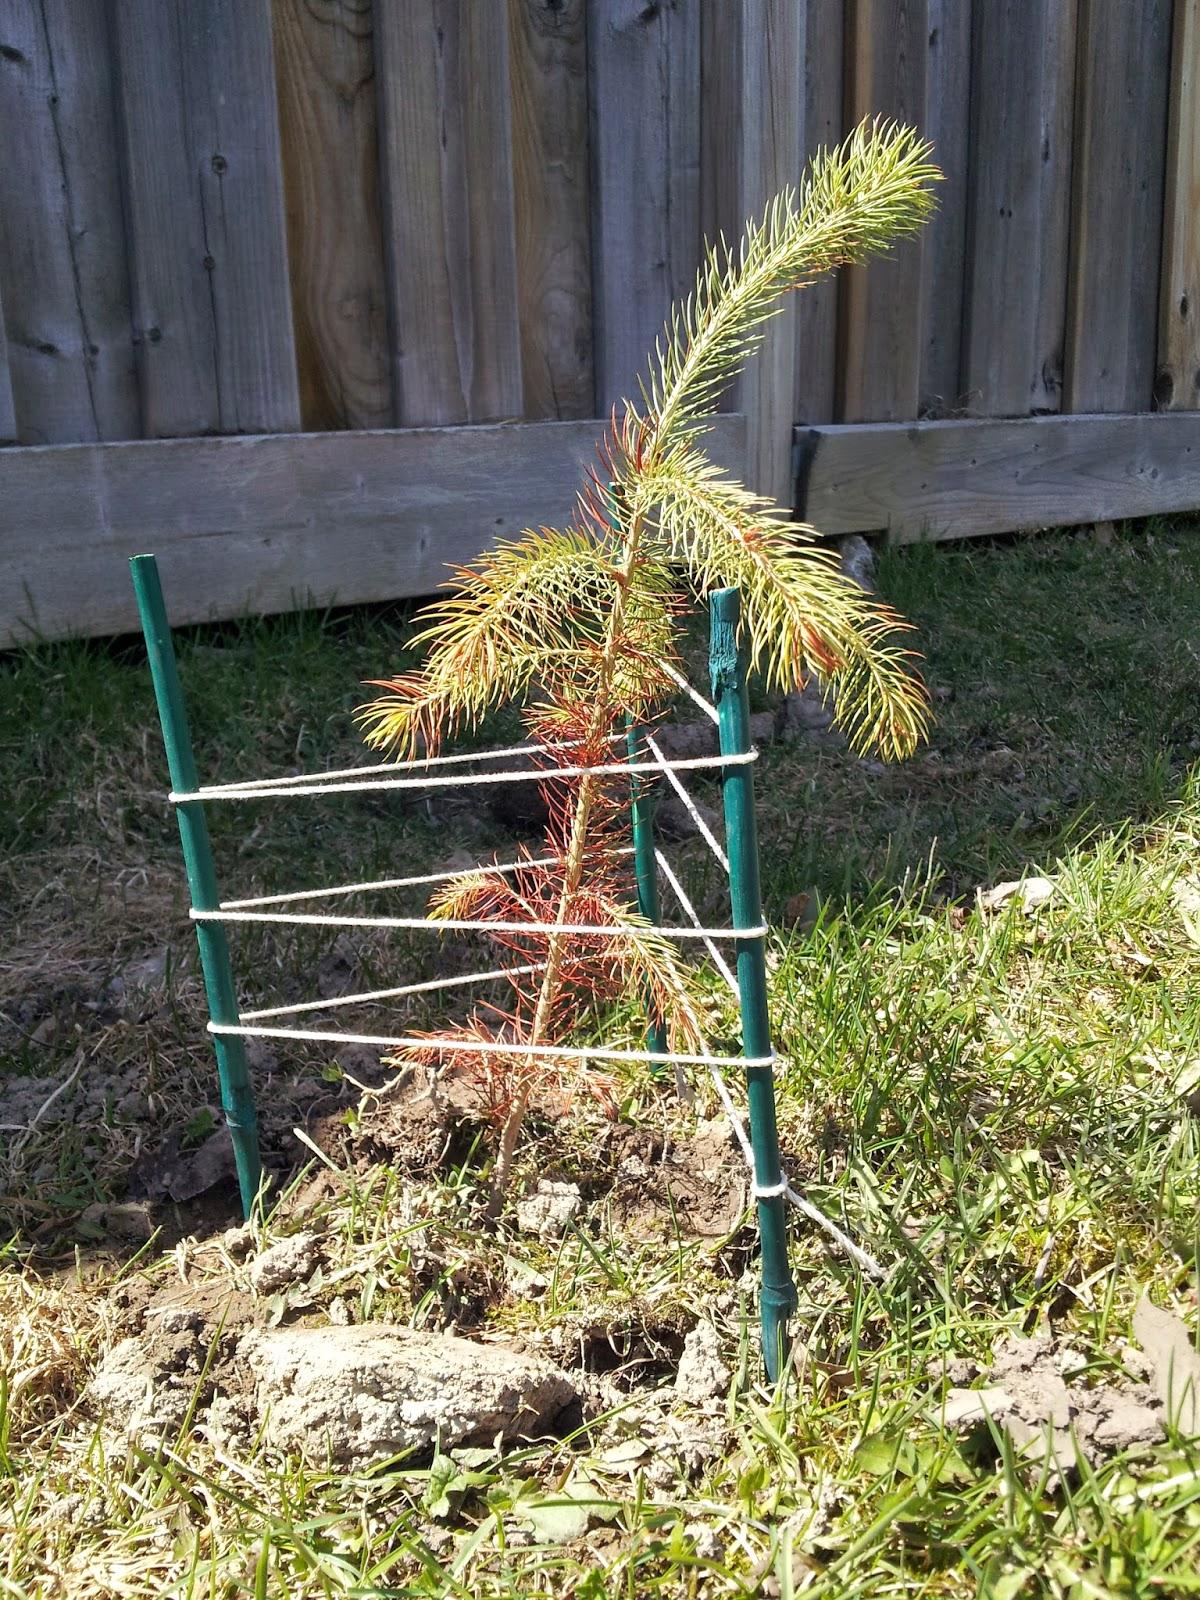 Earth Day Tree Sapling, kids activities